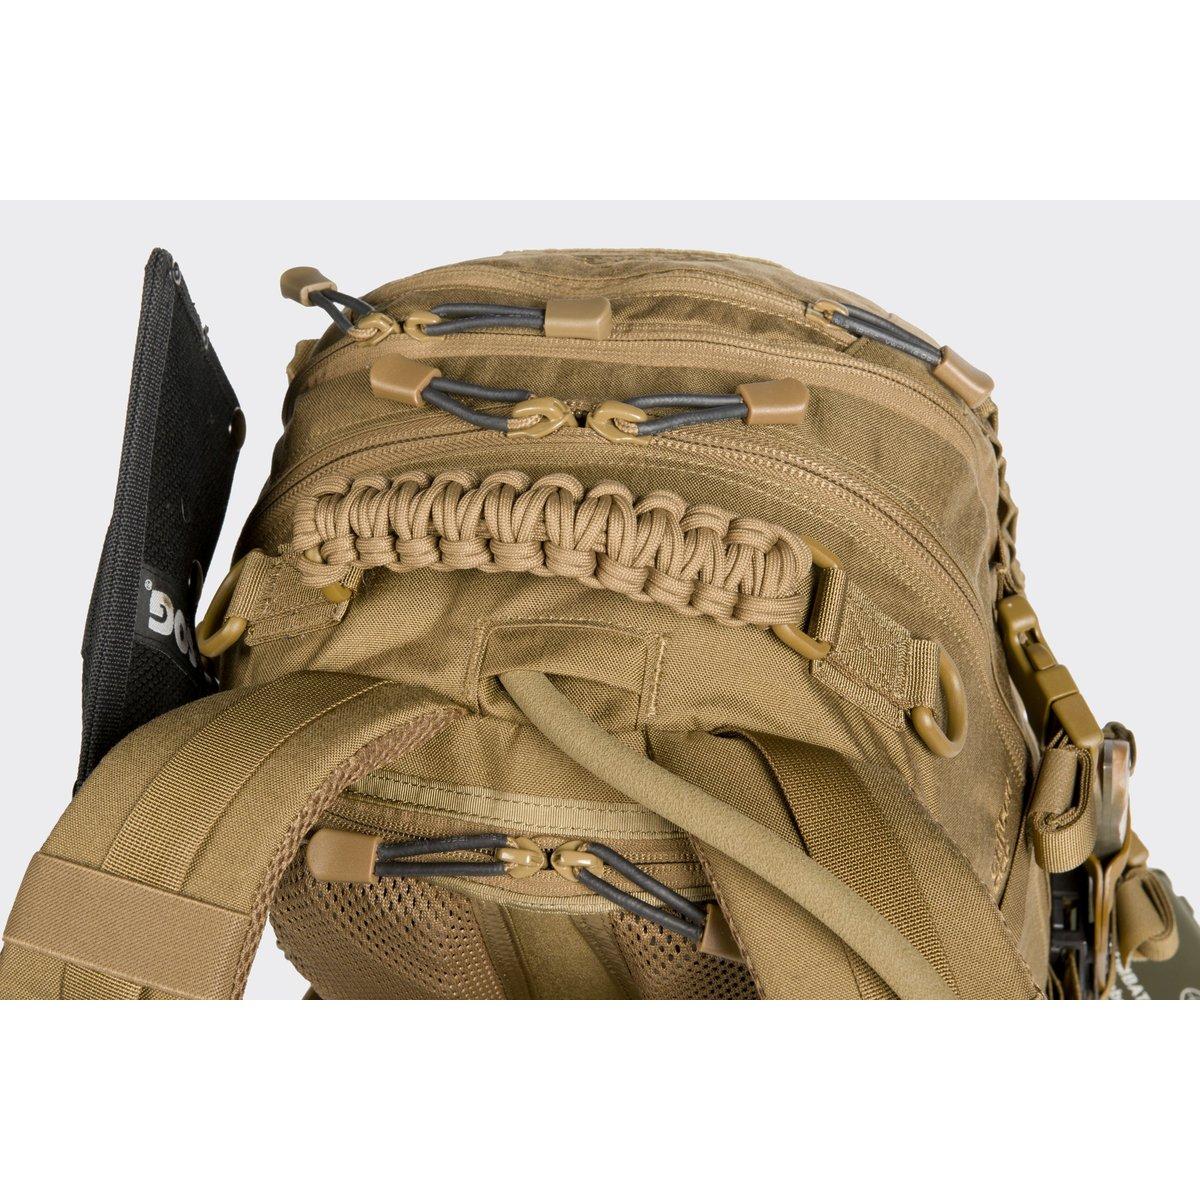 DIRECT ACTION DRAGON EGG MkII Backpack OUTDOOR RUCKSACK 25 L Olive Green